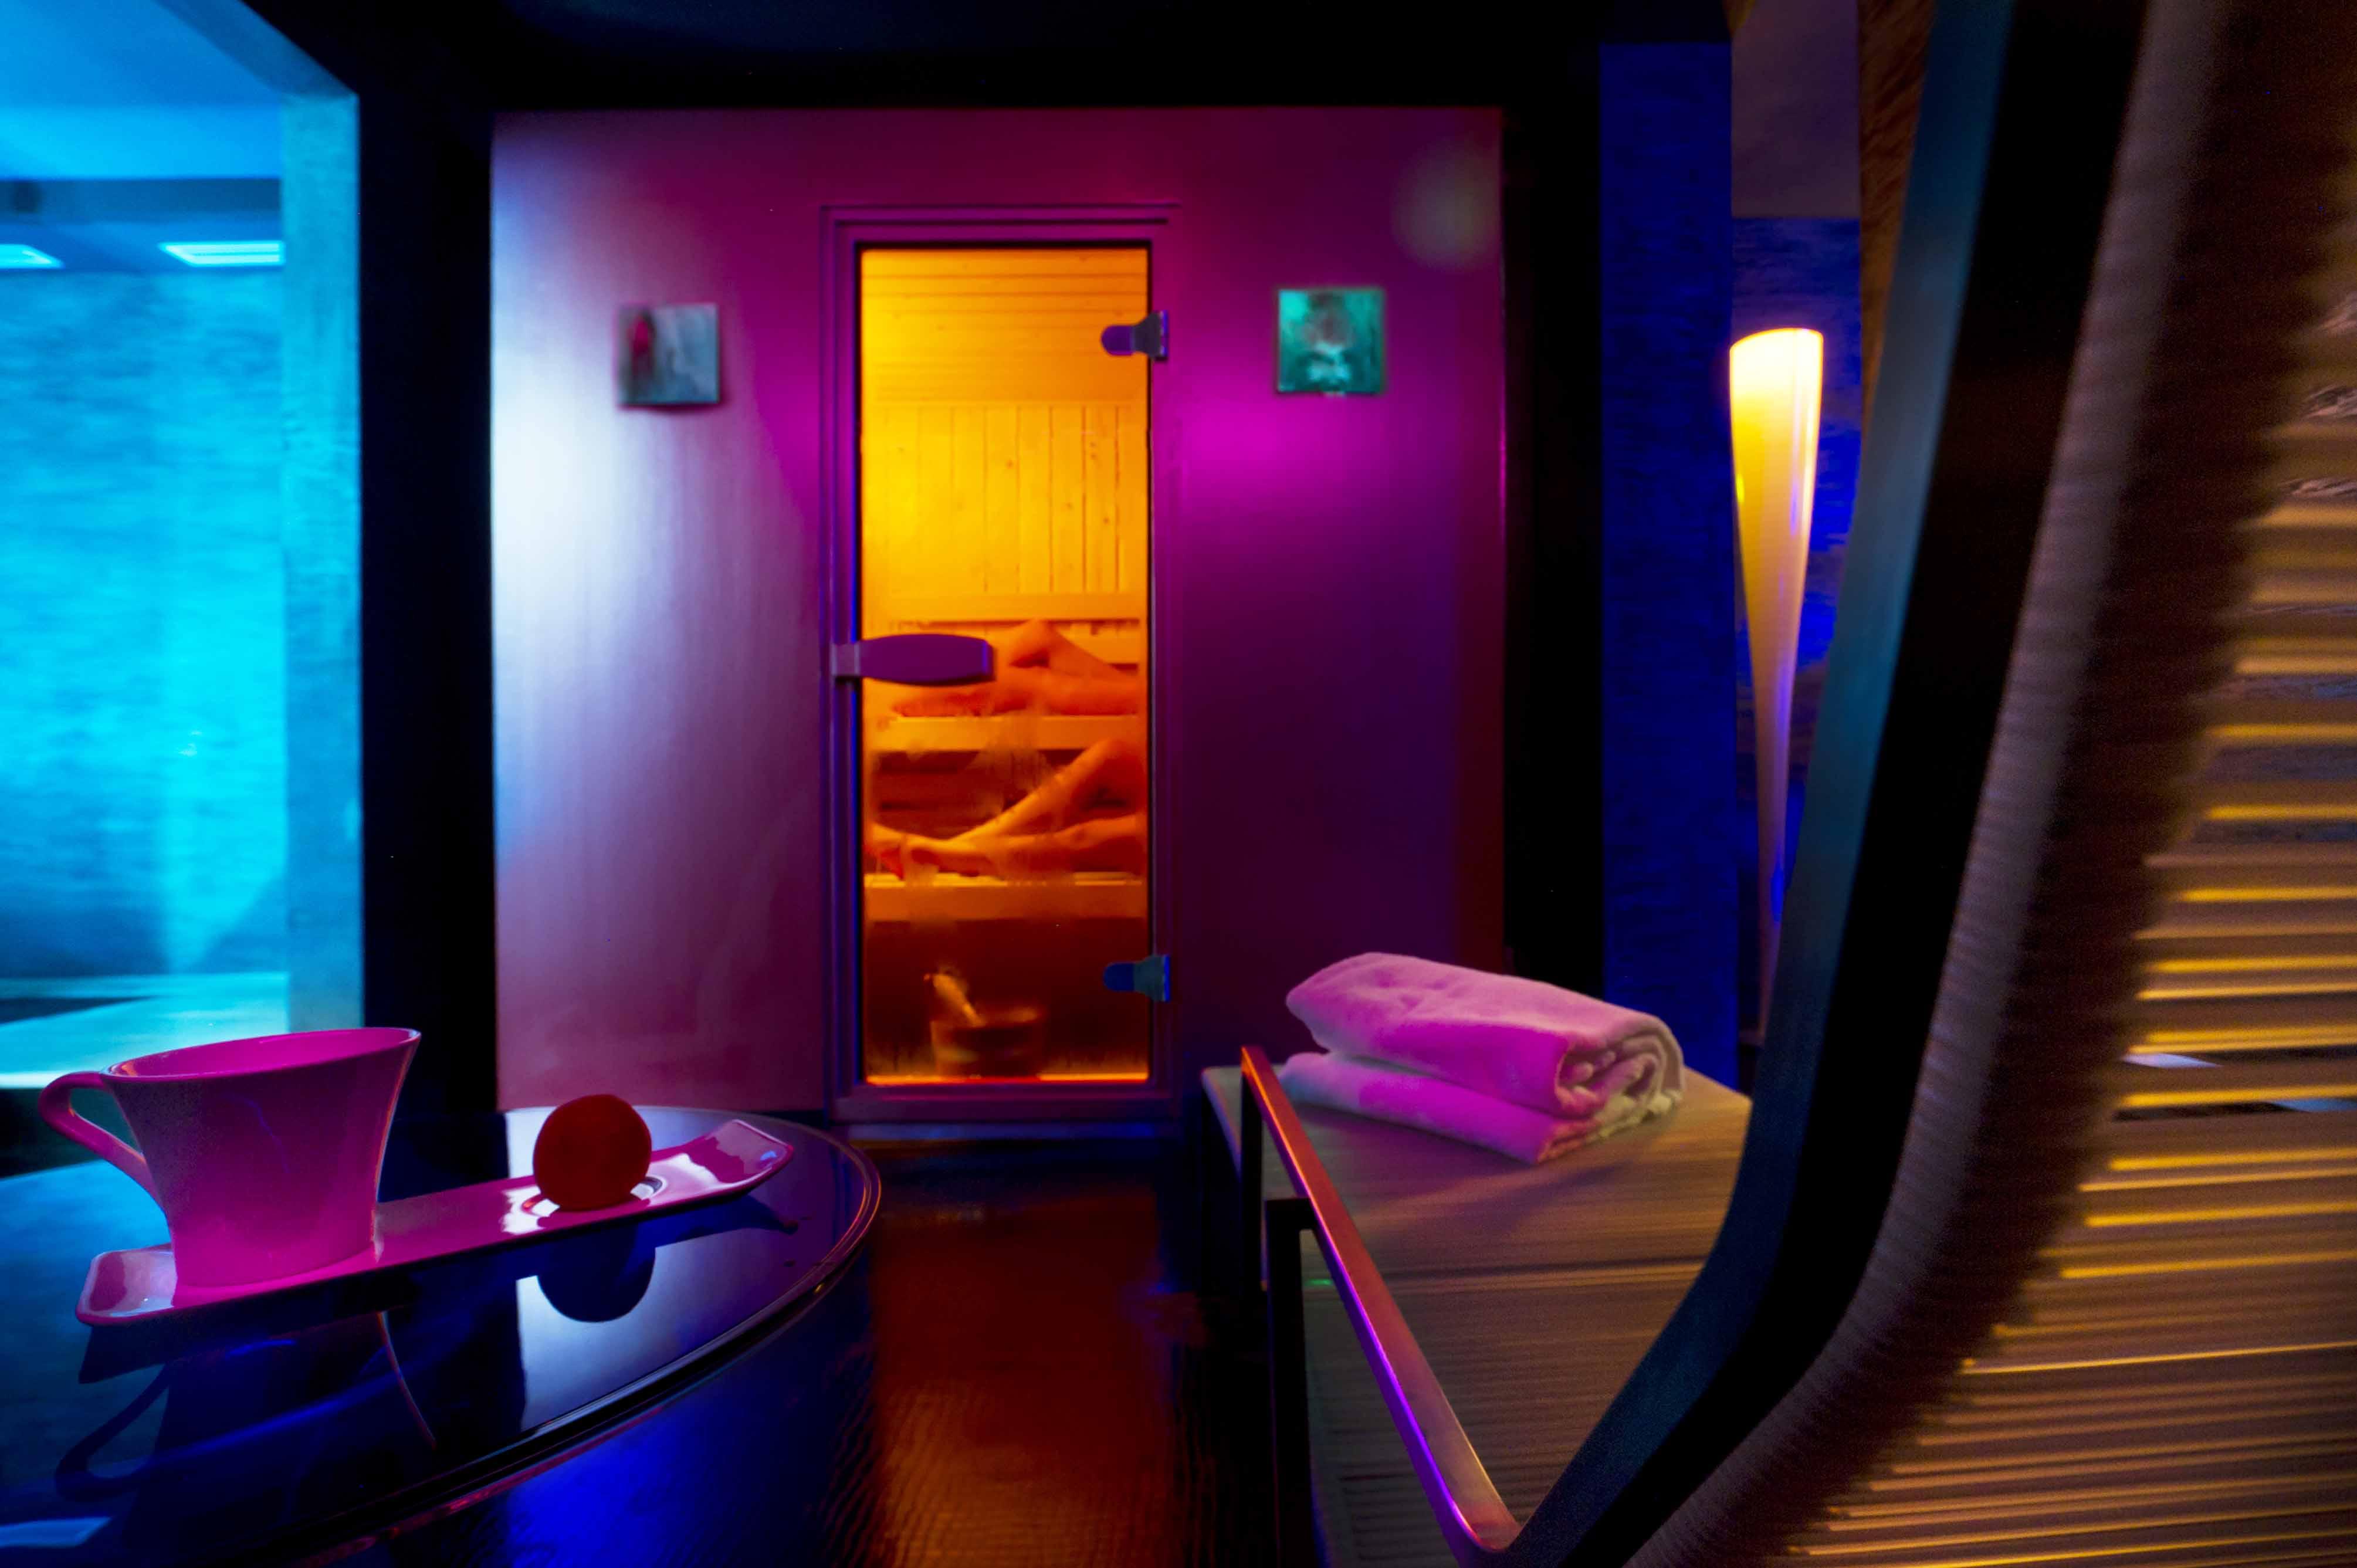 La monnaie art spa hotel la rochelle la rochelle compar dans 8 agences - Hotel de la monnaie la rochelle ...